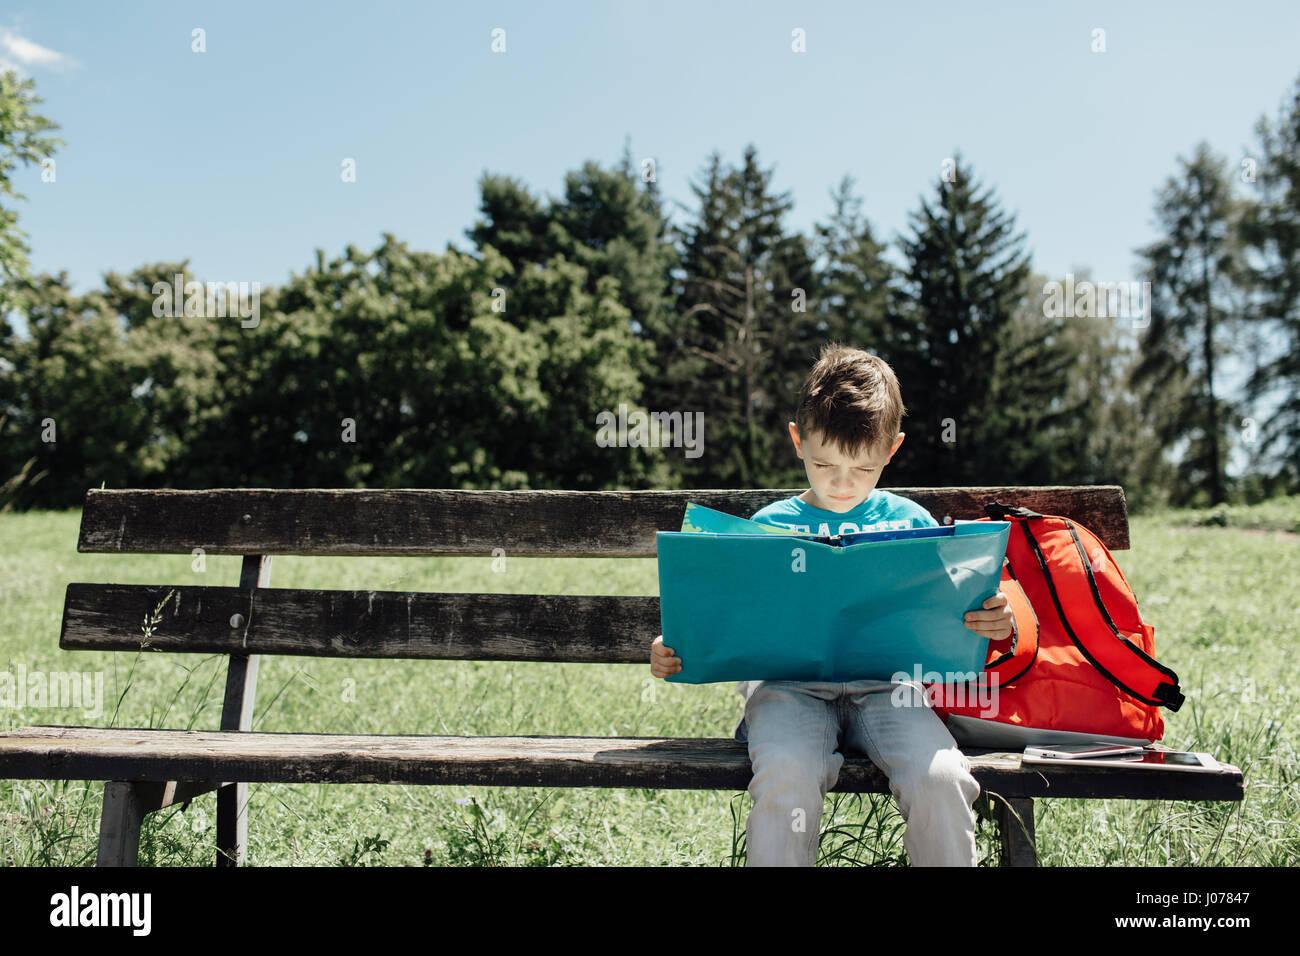 BOY SITTING ALONE ON BENCH